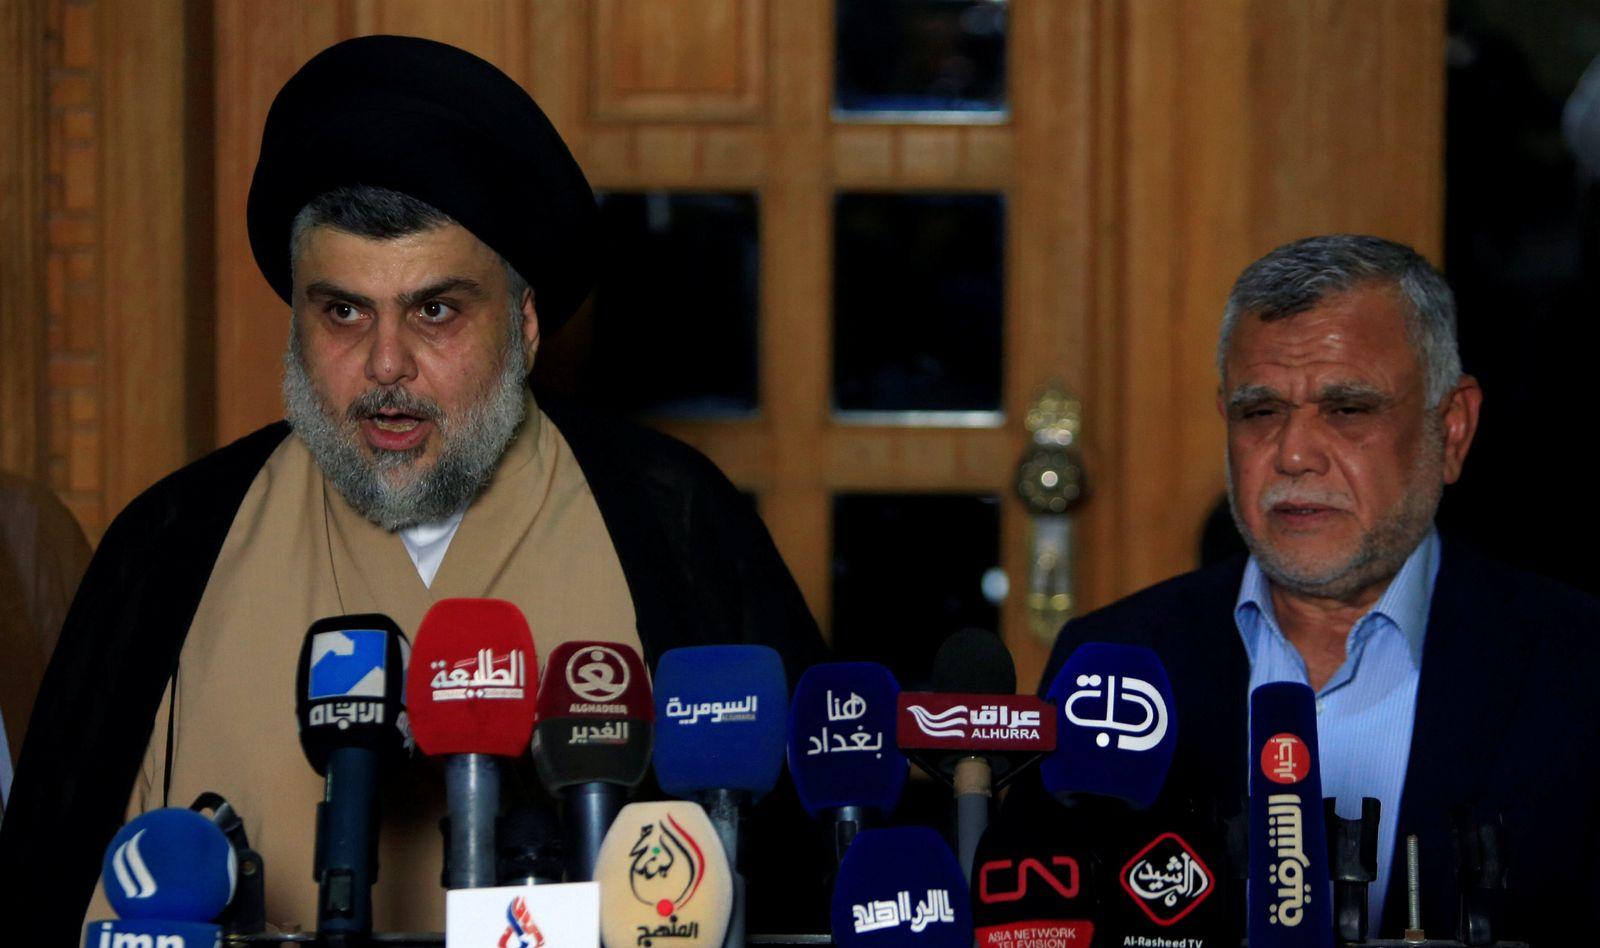 Irak/Muktada al-Sadr